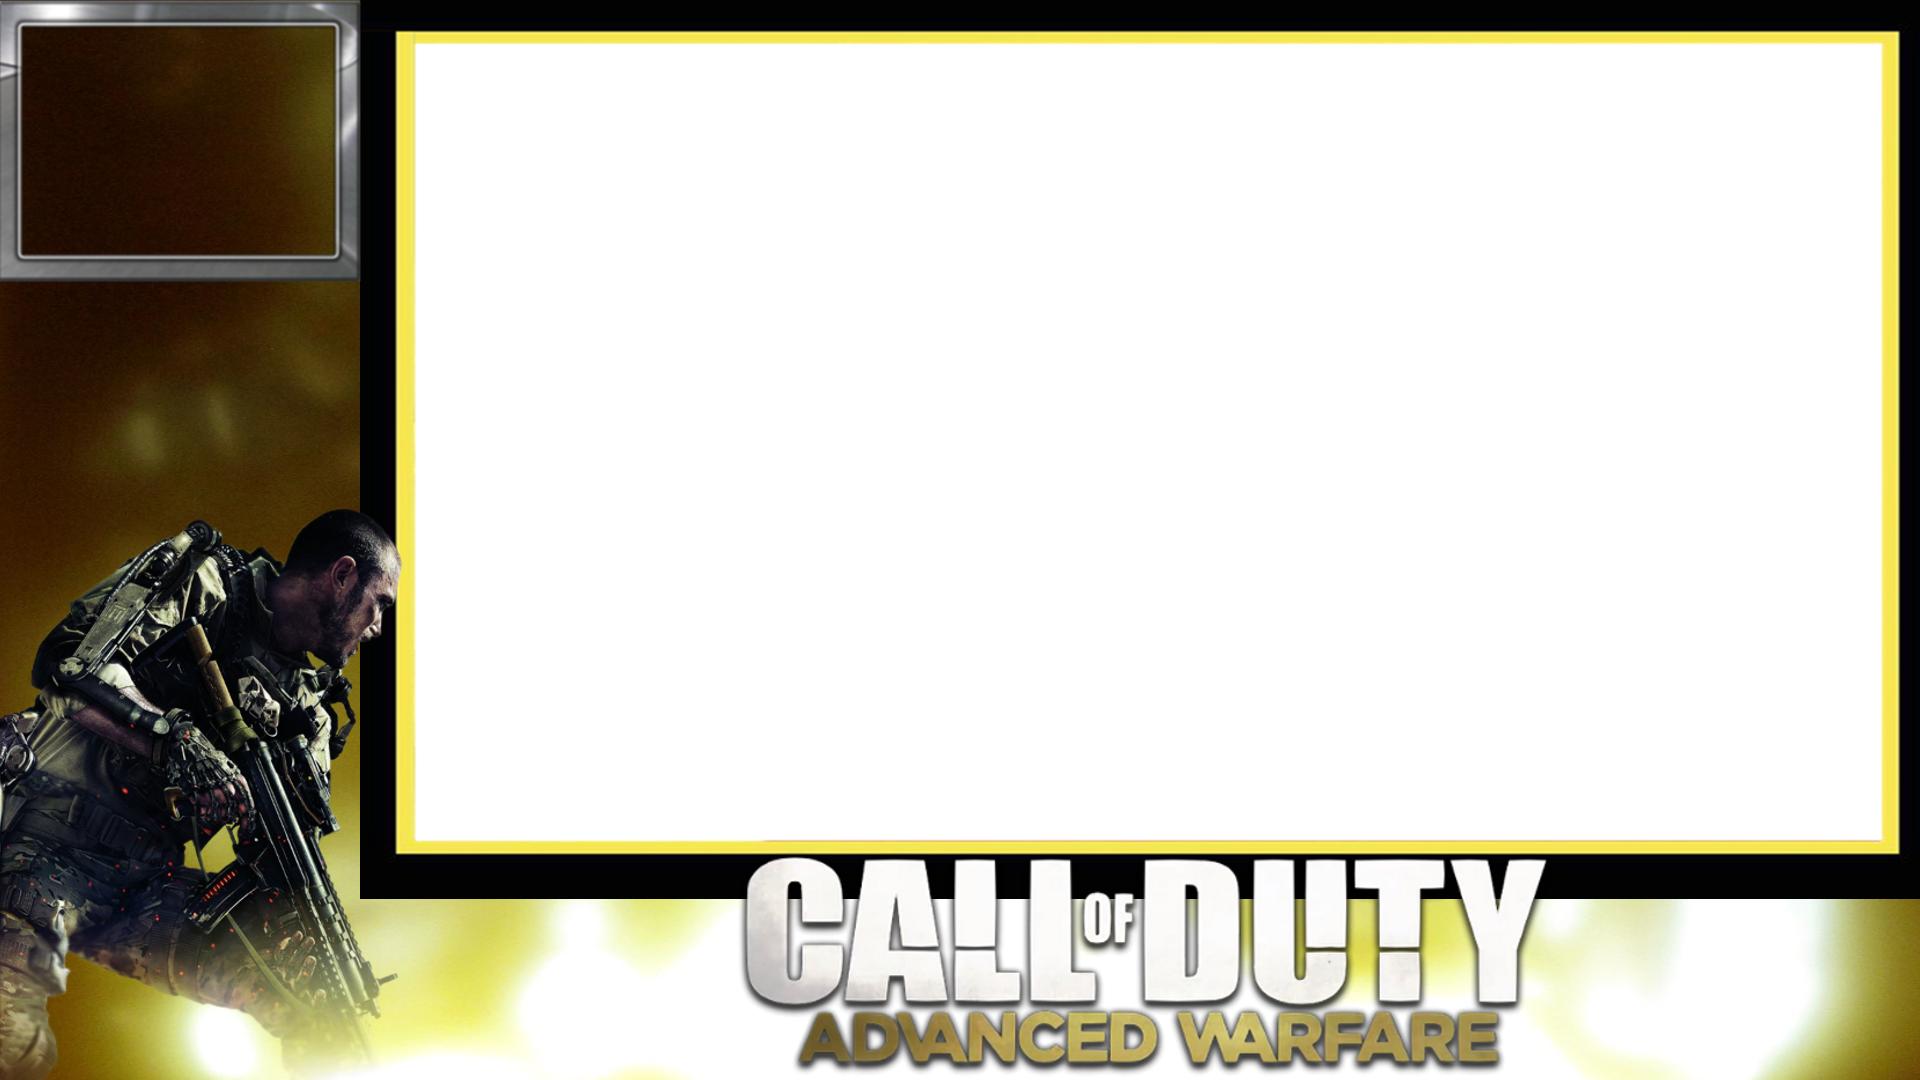 Advanced Warfare Background for Twitch and YouTube ...  Advanced Warfar...